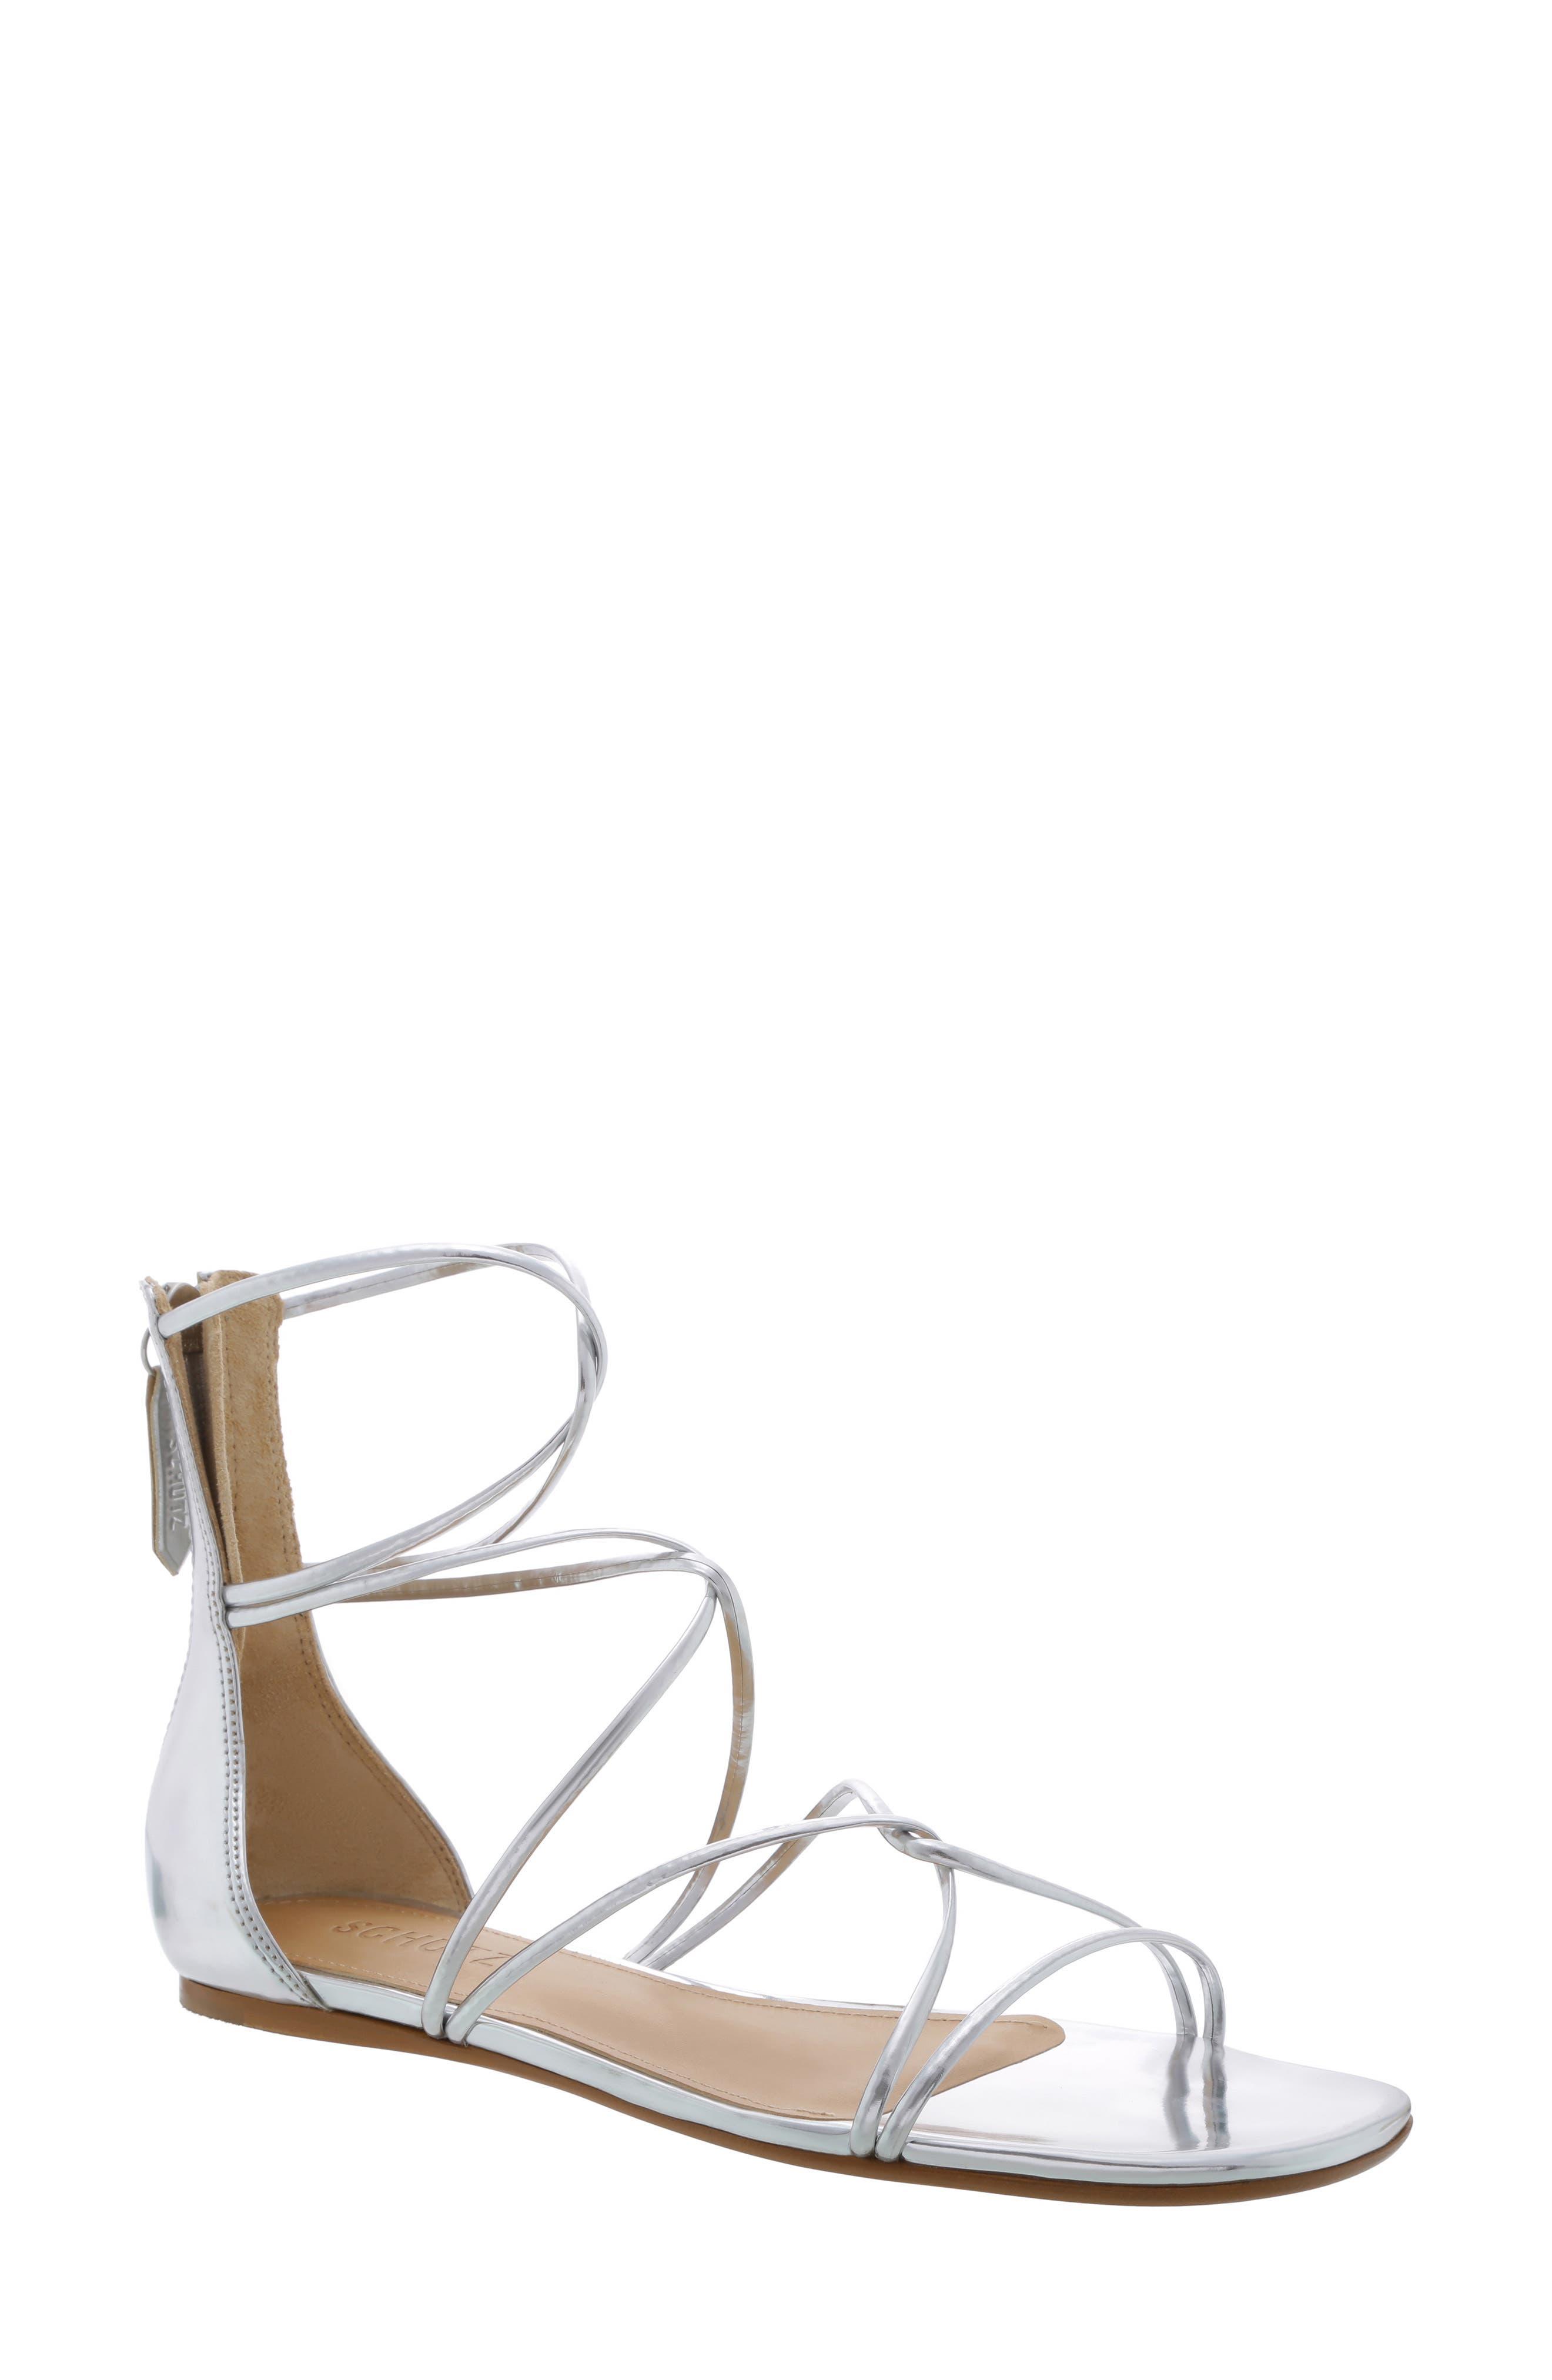 Schutz Fabia Strappy Sandal- Metallic